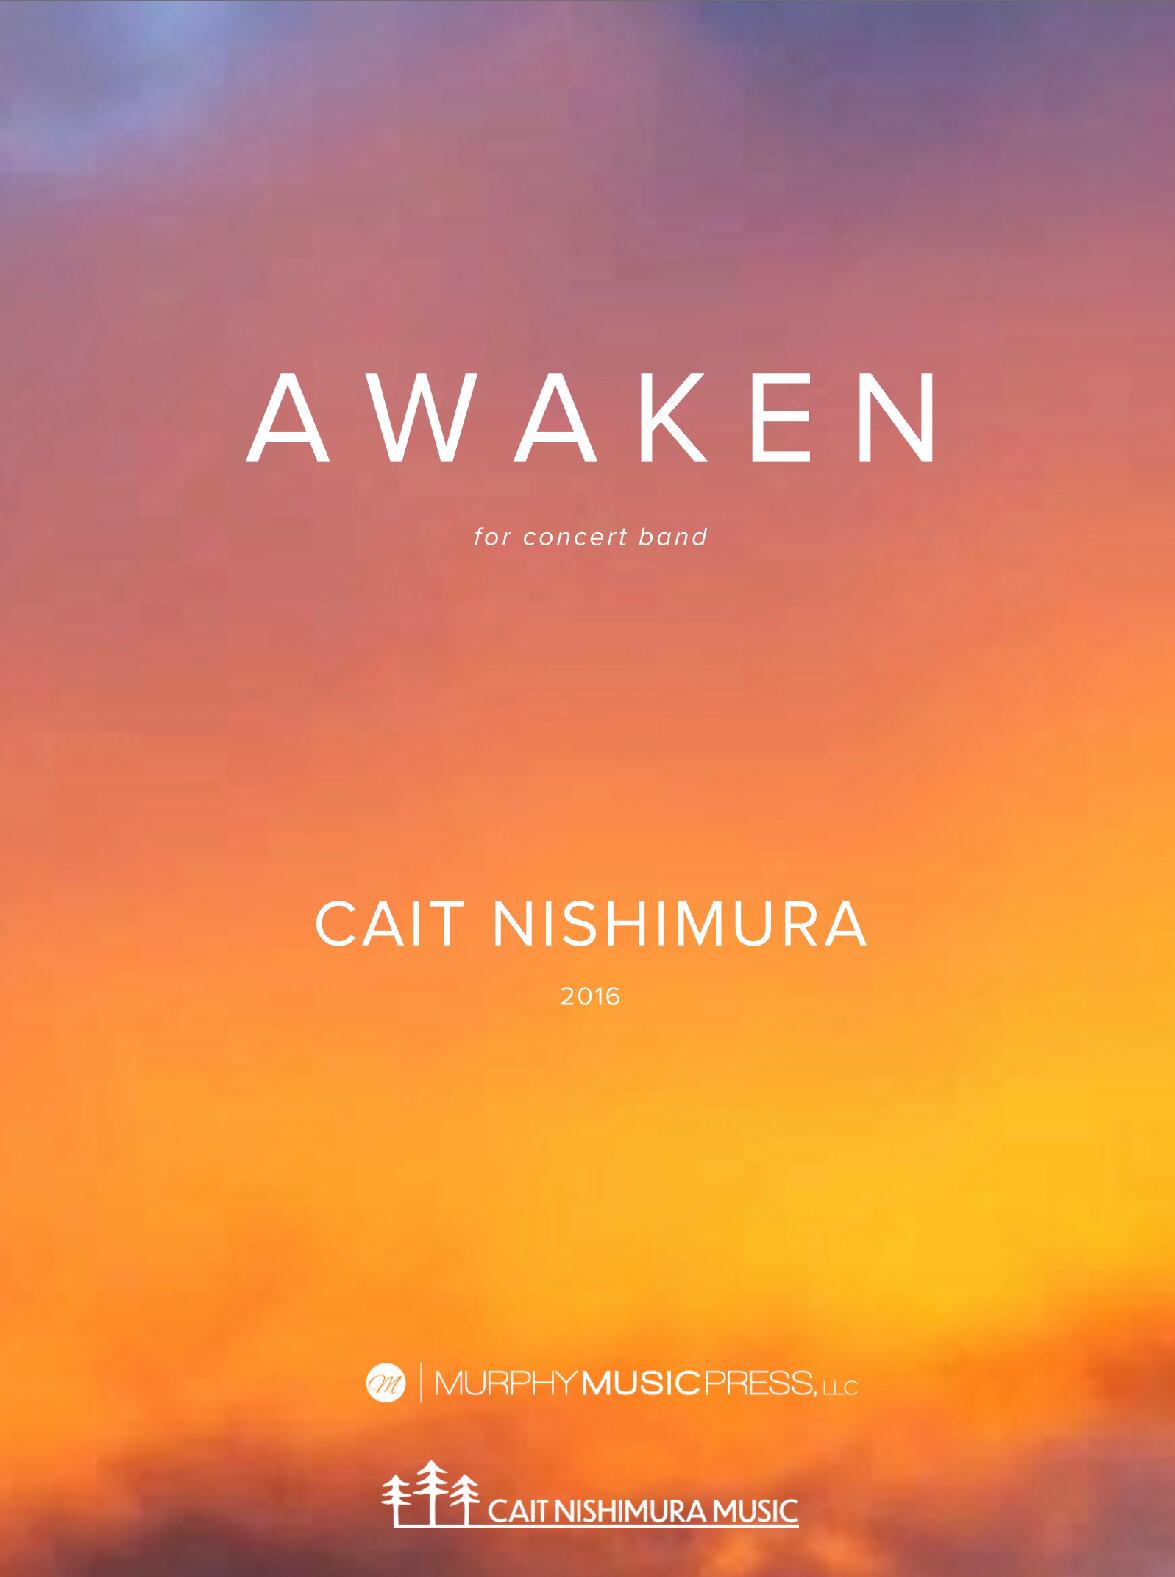 Awaken by Cait Nishimura